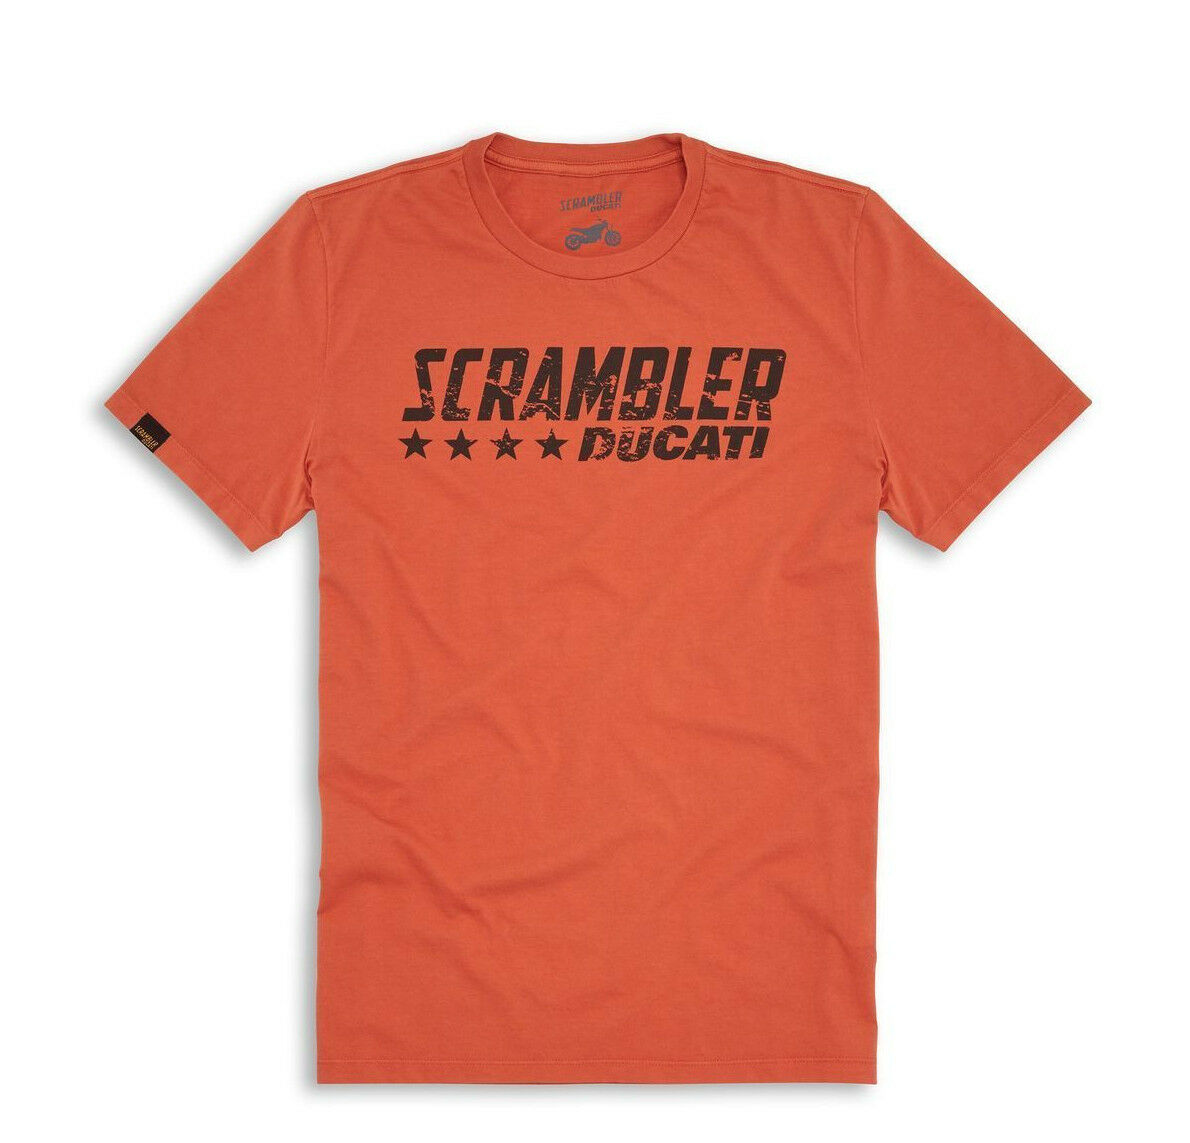 Ducati Scrambler Arancione Flip T-Shirt Manica Corta Arancione Nuovo